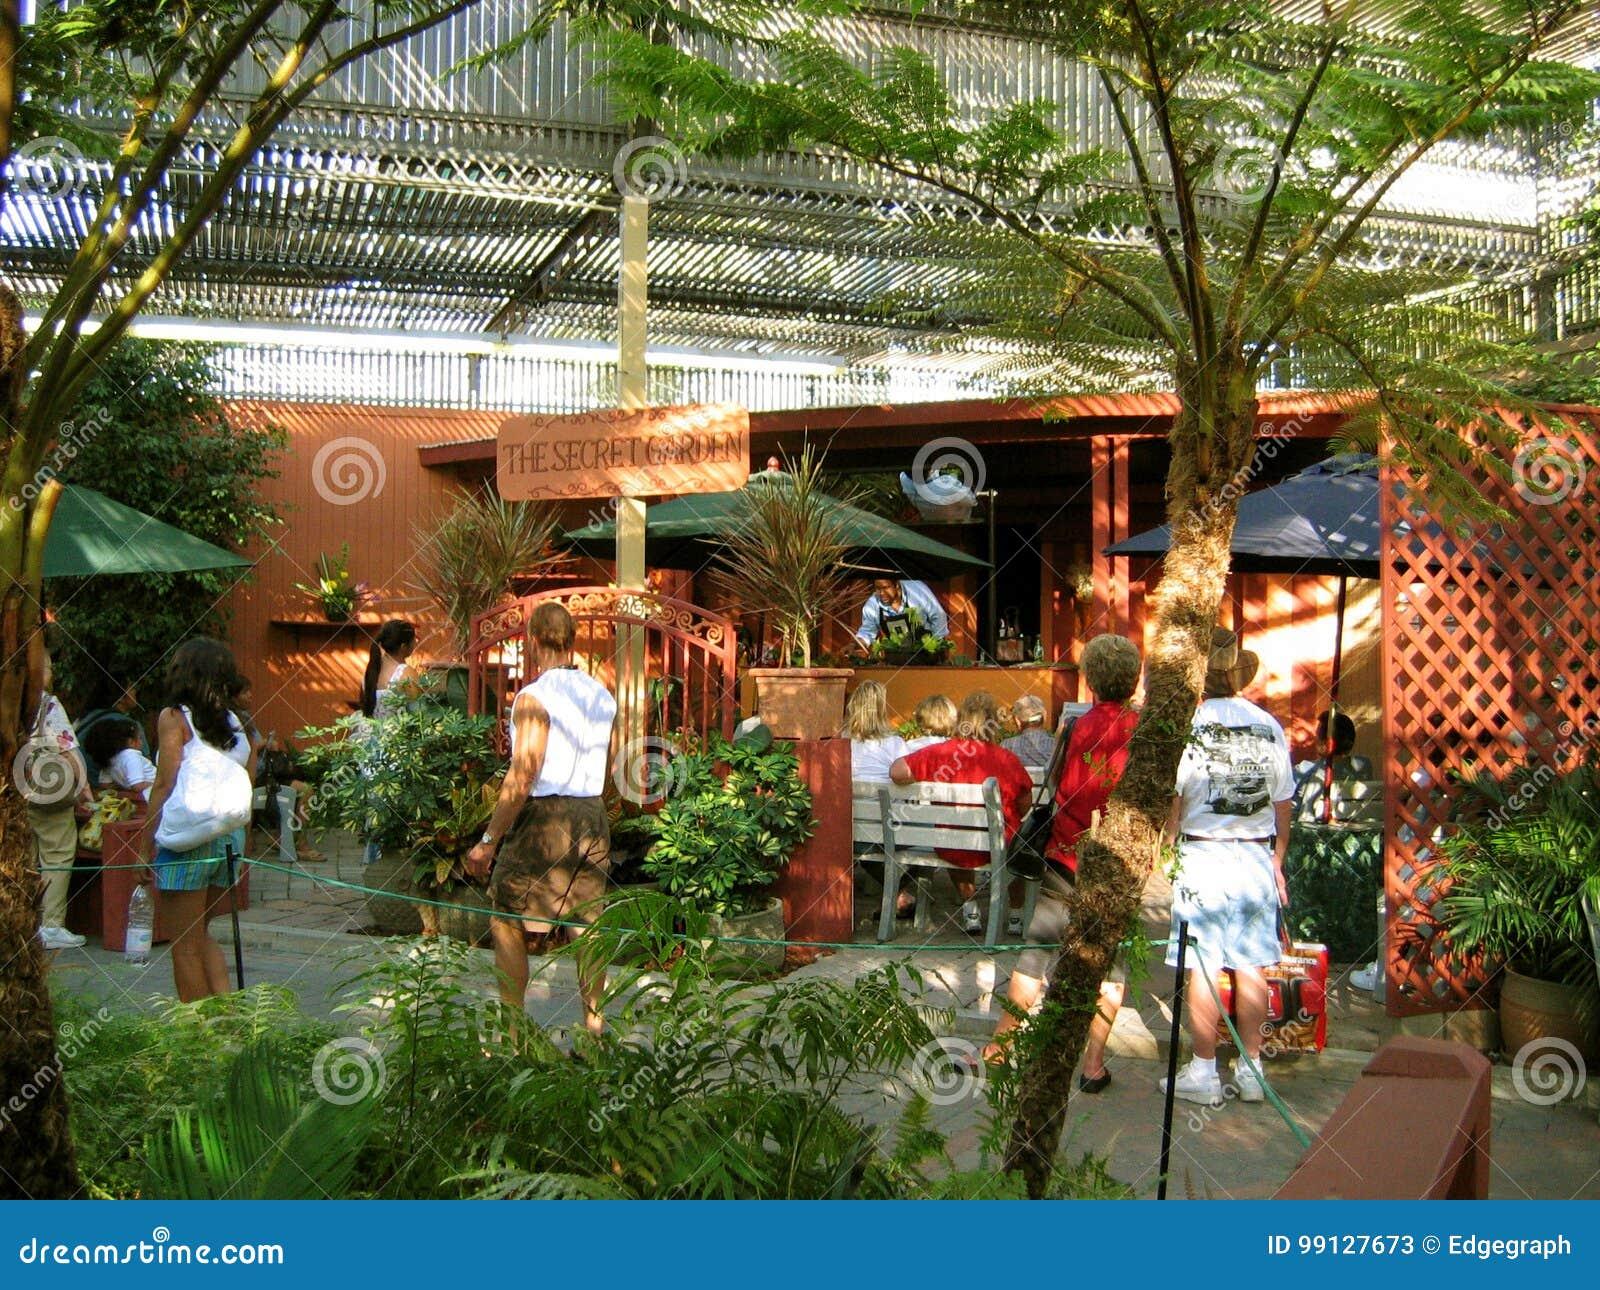 The Secret Garden, Los Angeles County Fair, Fairplex, Pomona ...